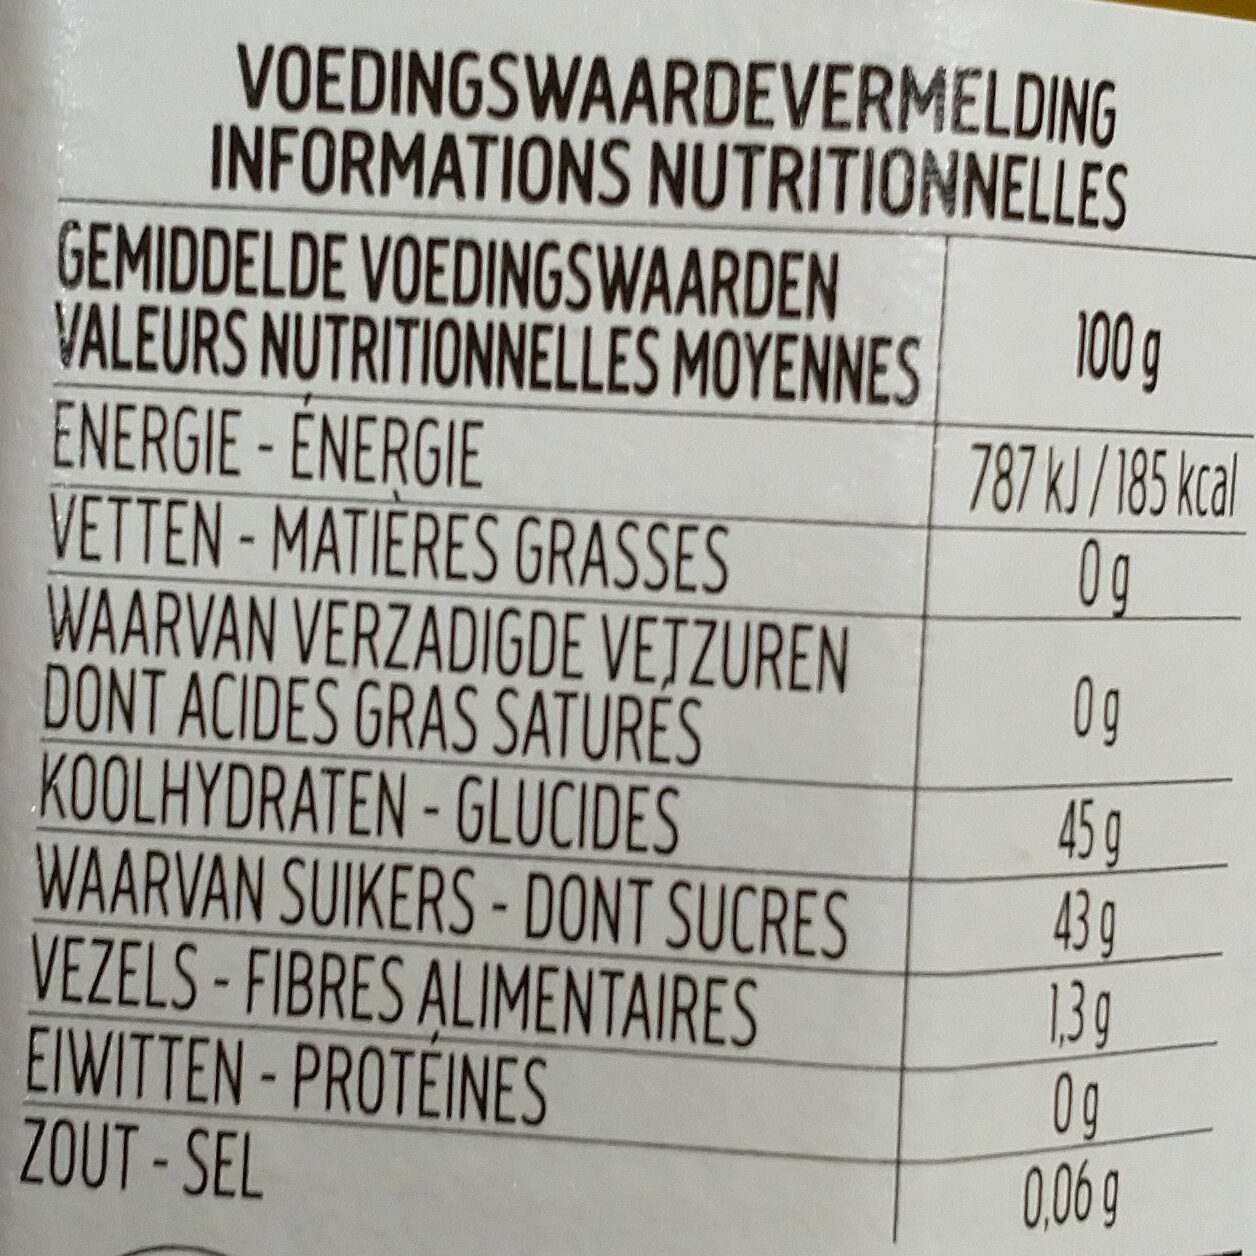 Fiordifrutta agrumes et gingembre - Voedingswaarden - fr